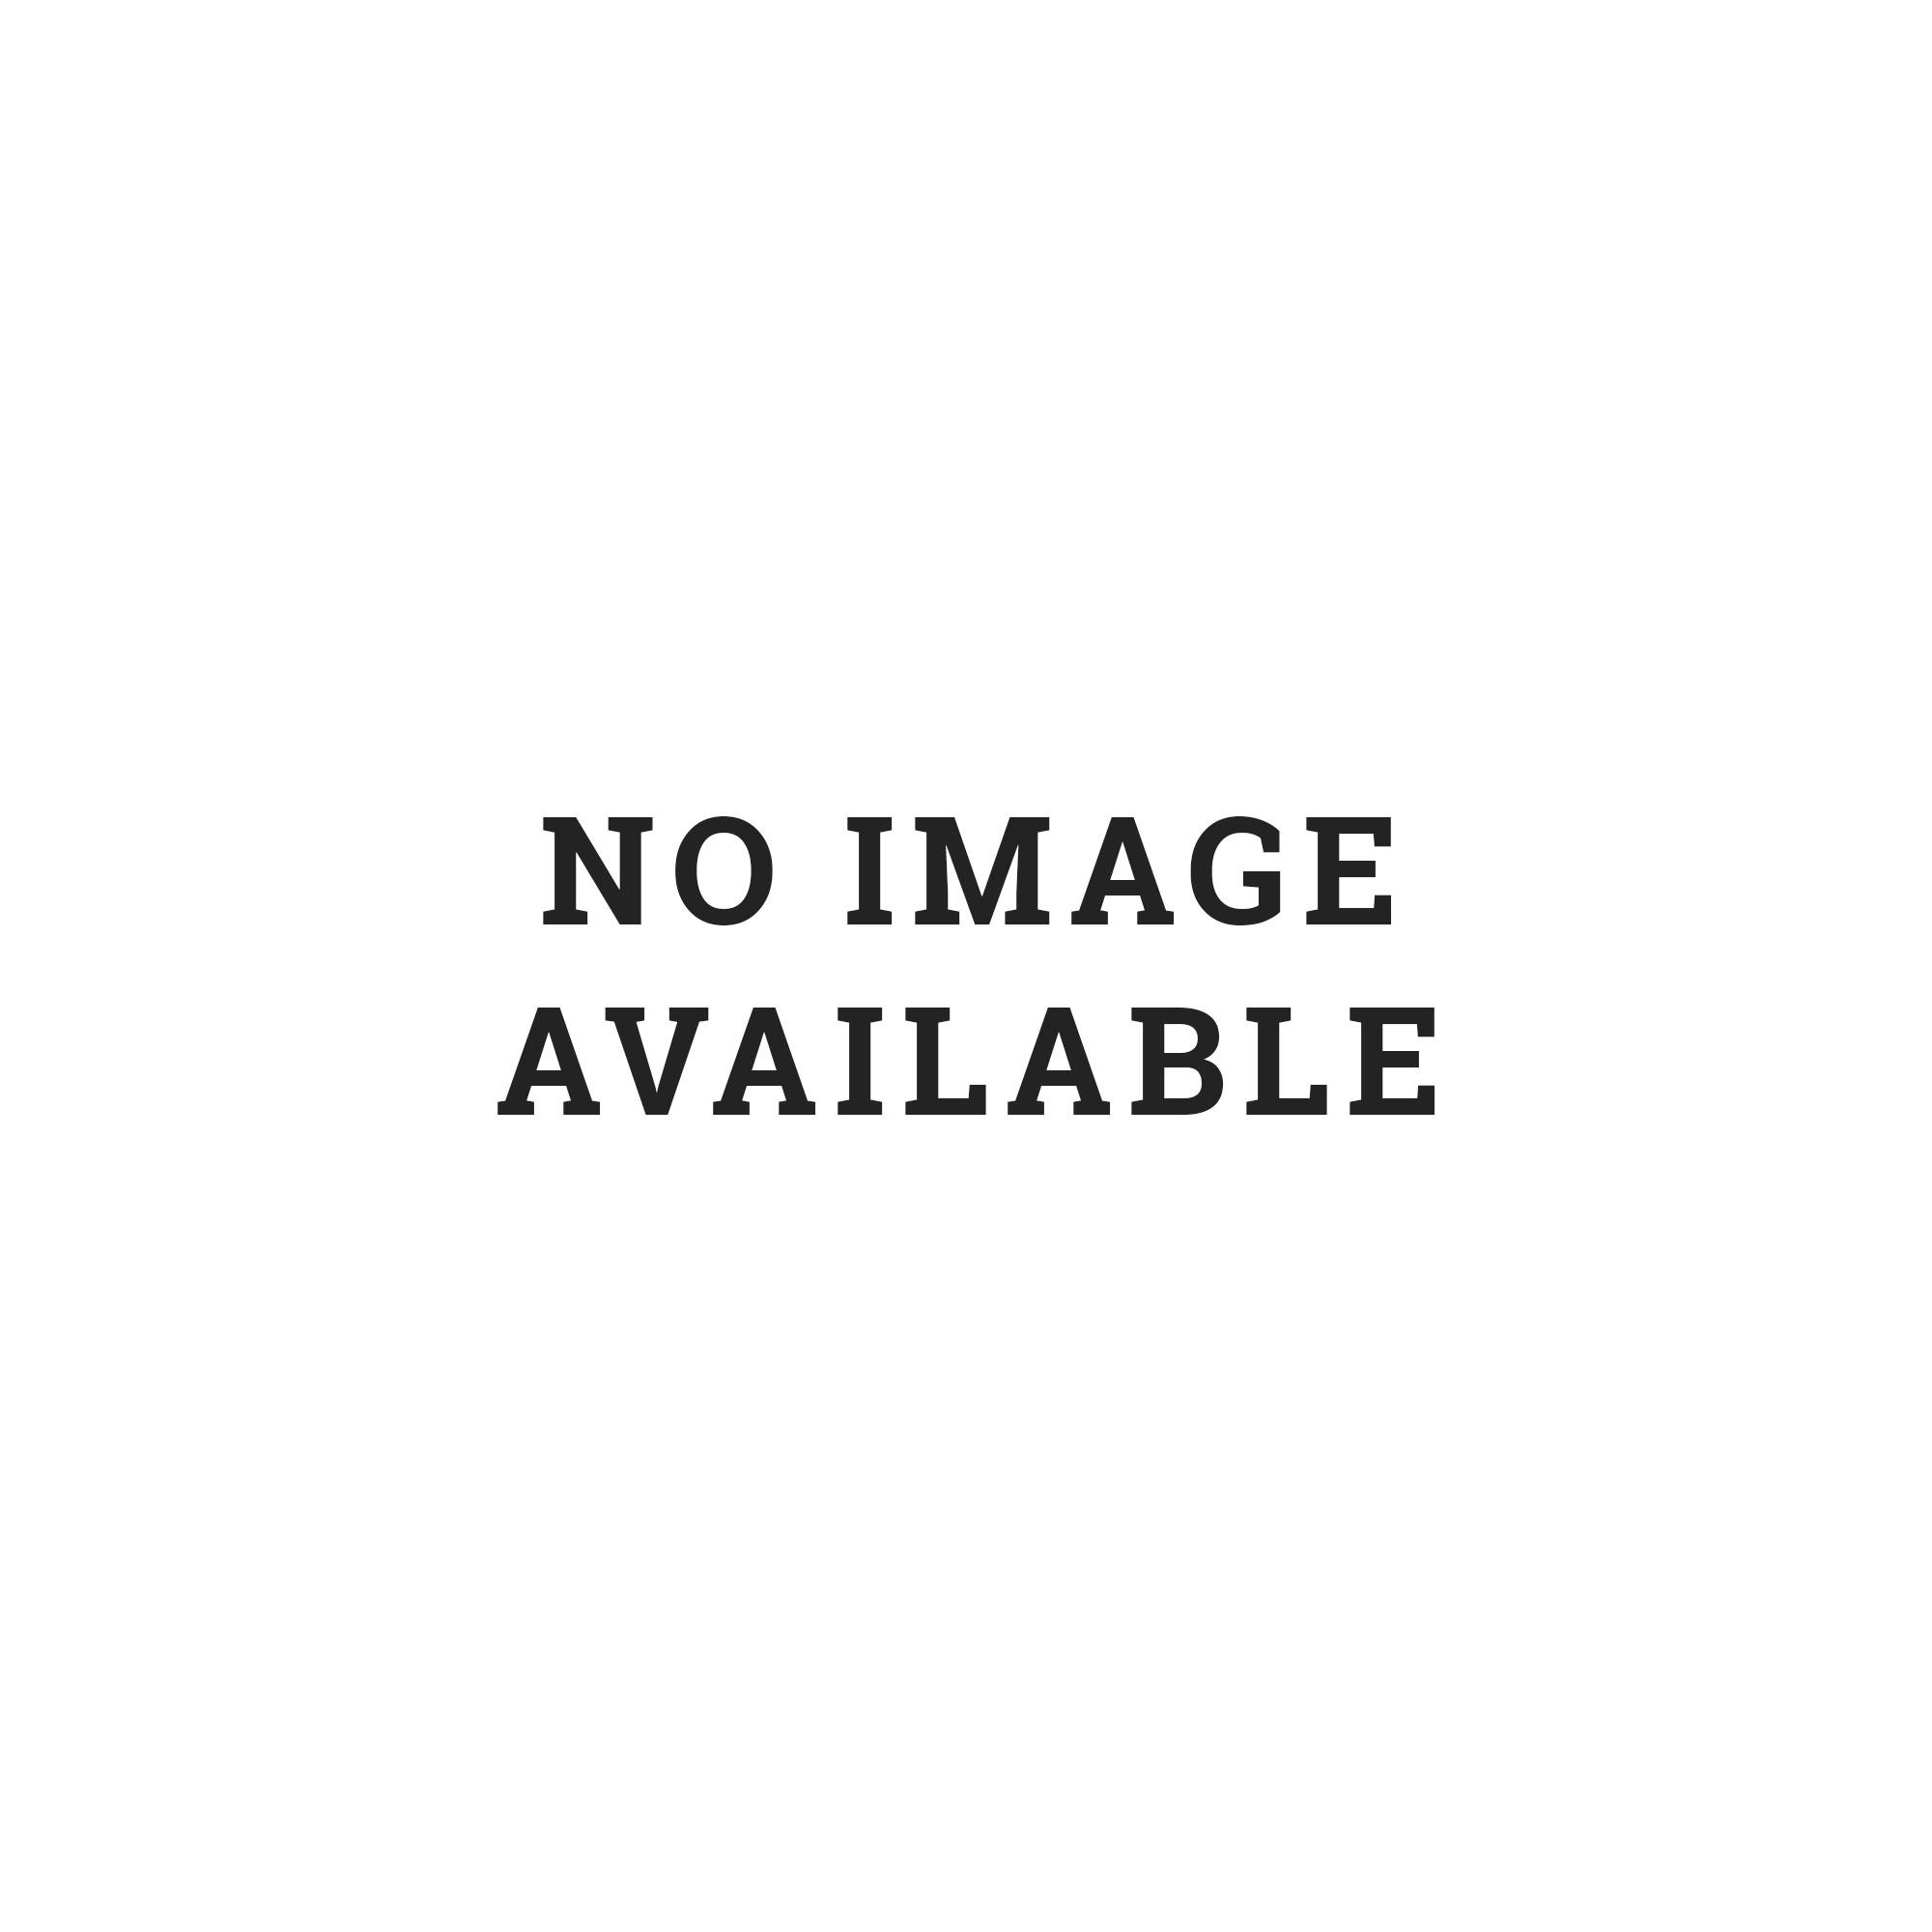 Vans Authentic VN-0 QER5U8 Unisex Canvas 5-Eyelet Deck Shoes - Port Royale Burgundy & Black